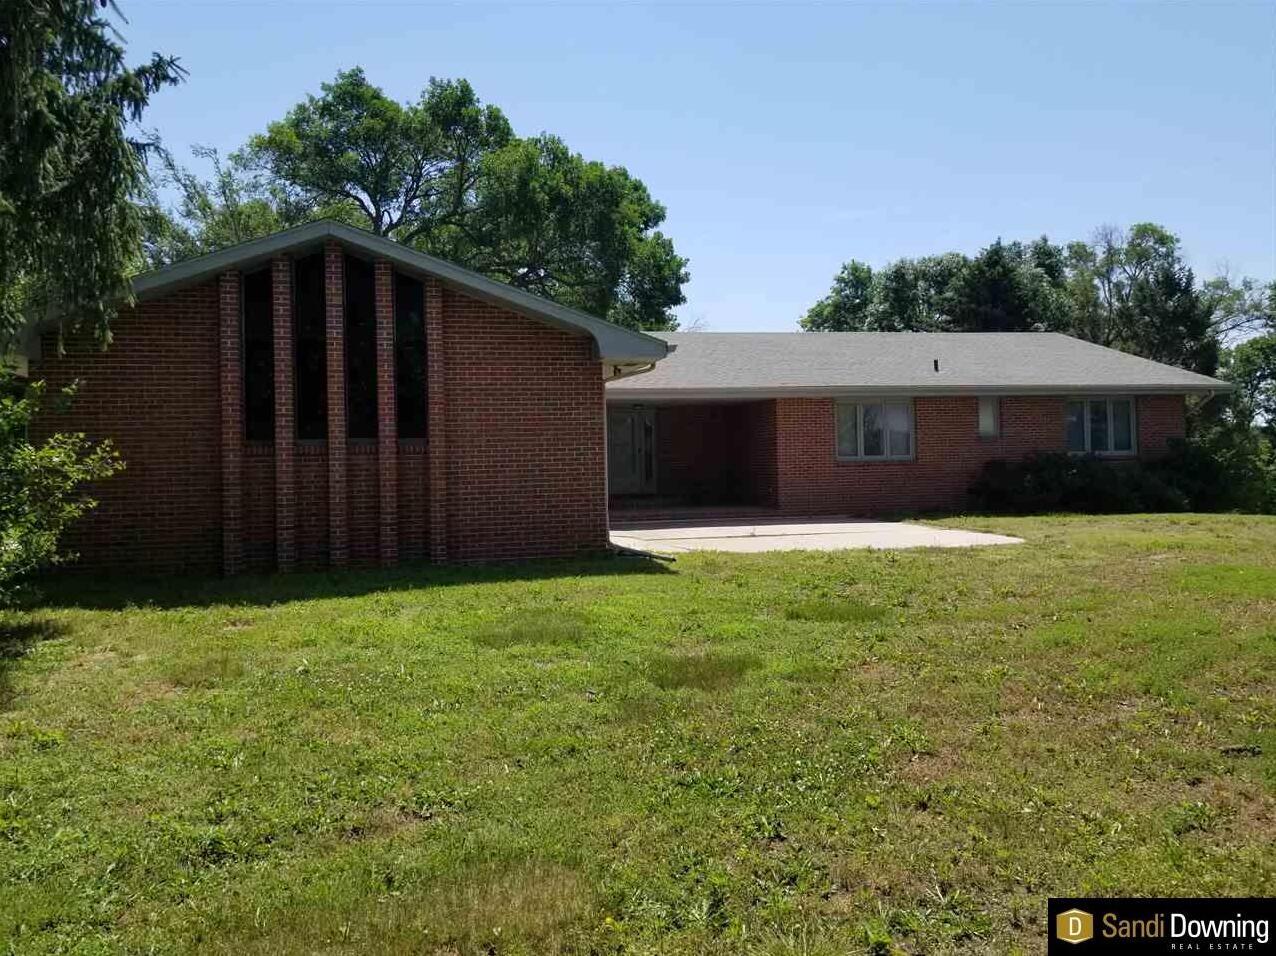 Photo of 2650 N 112 Street Lincoln NE 68527